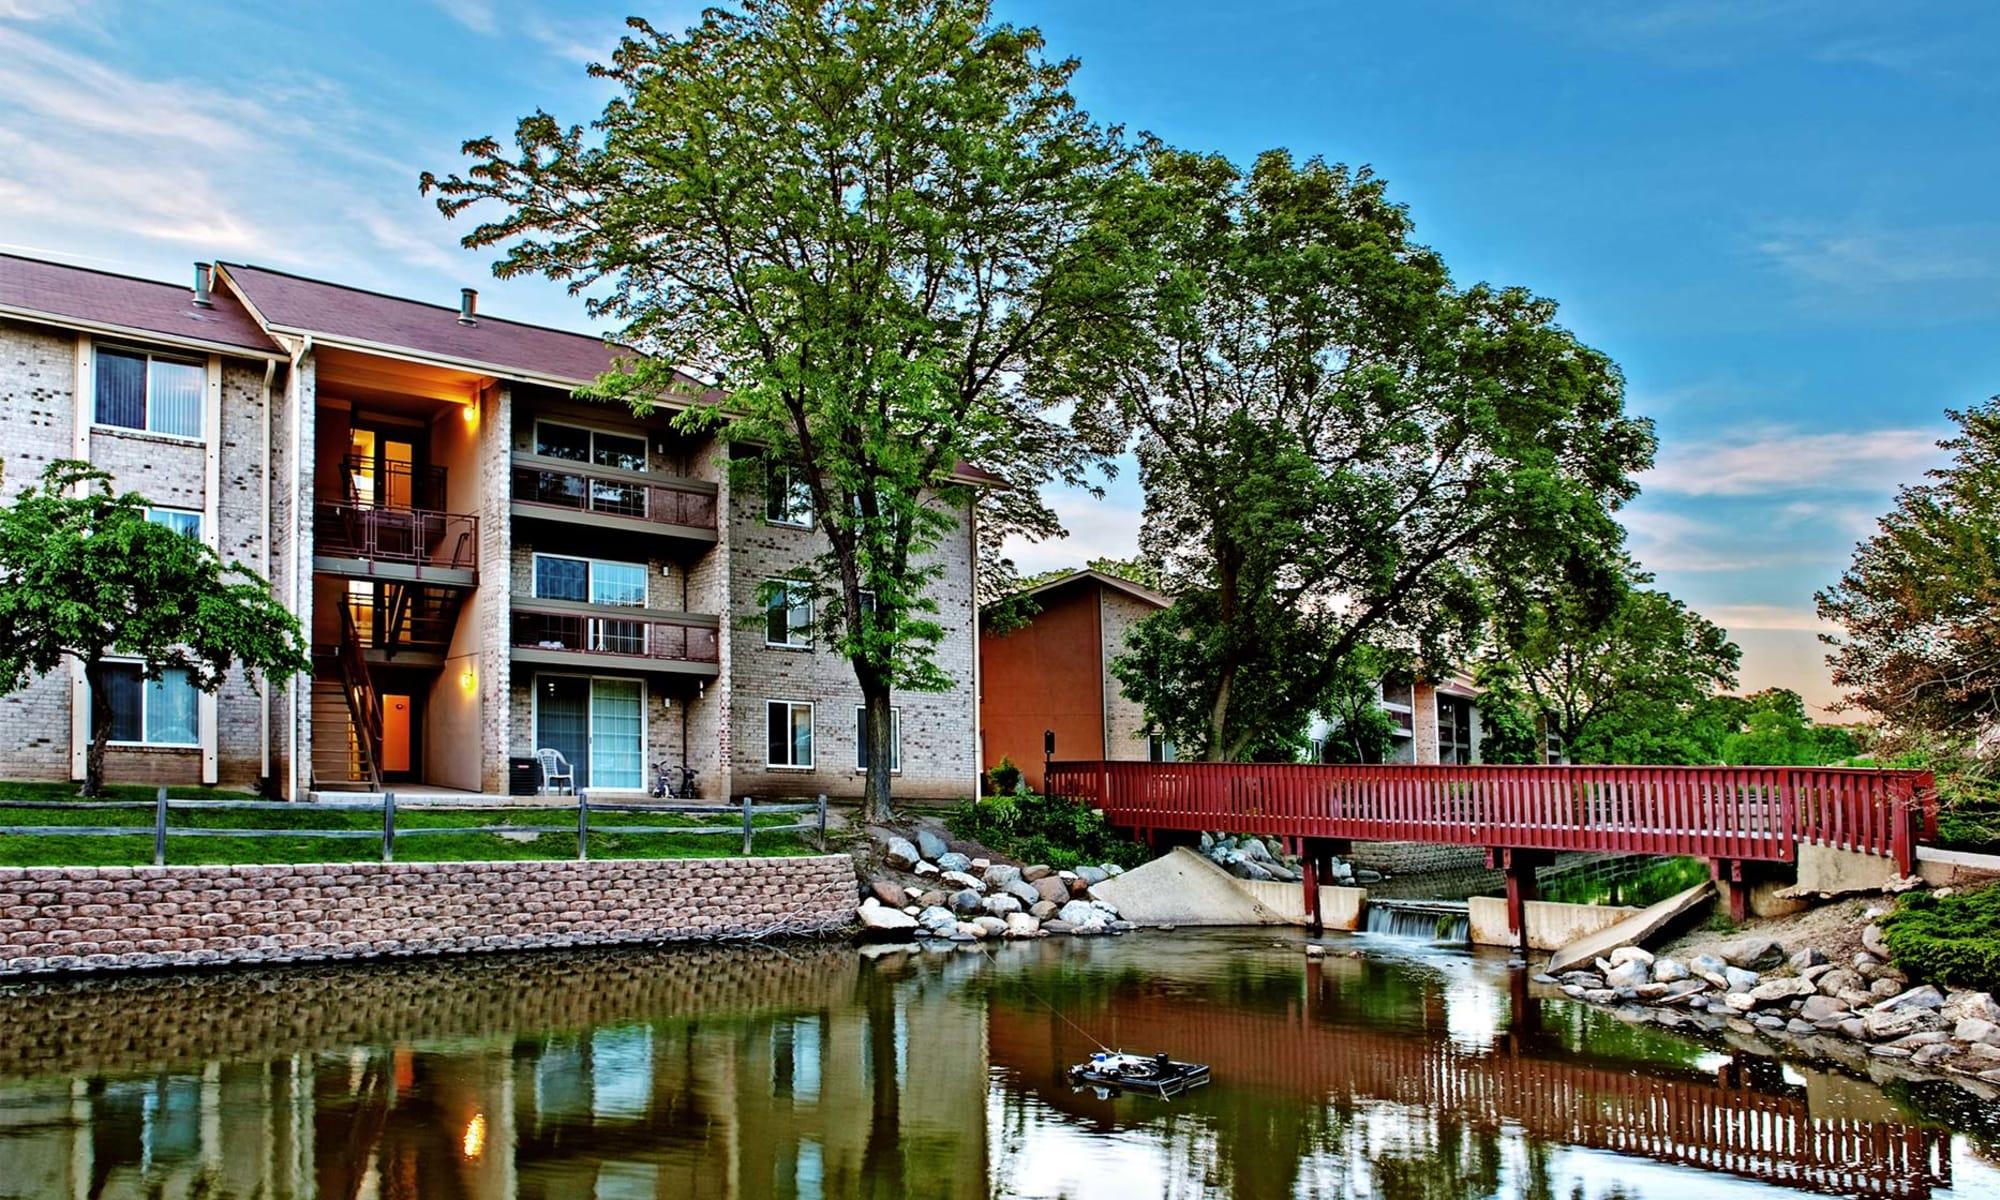 Lakeside Apartments in Lisle, Illinois